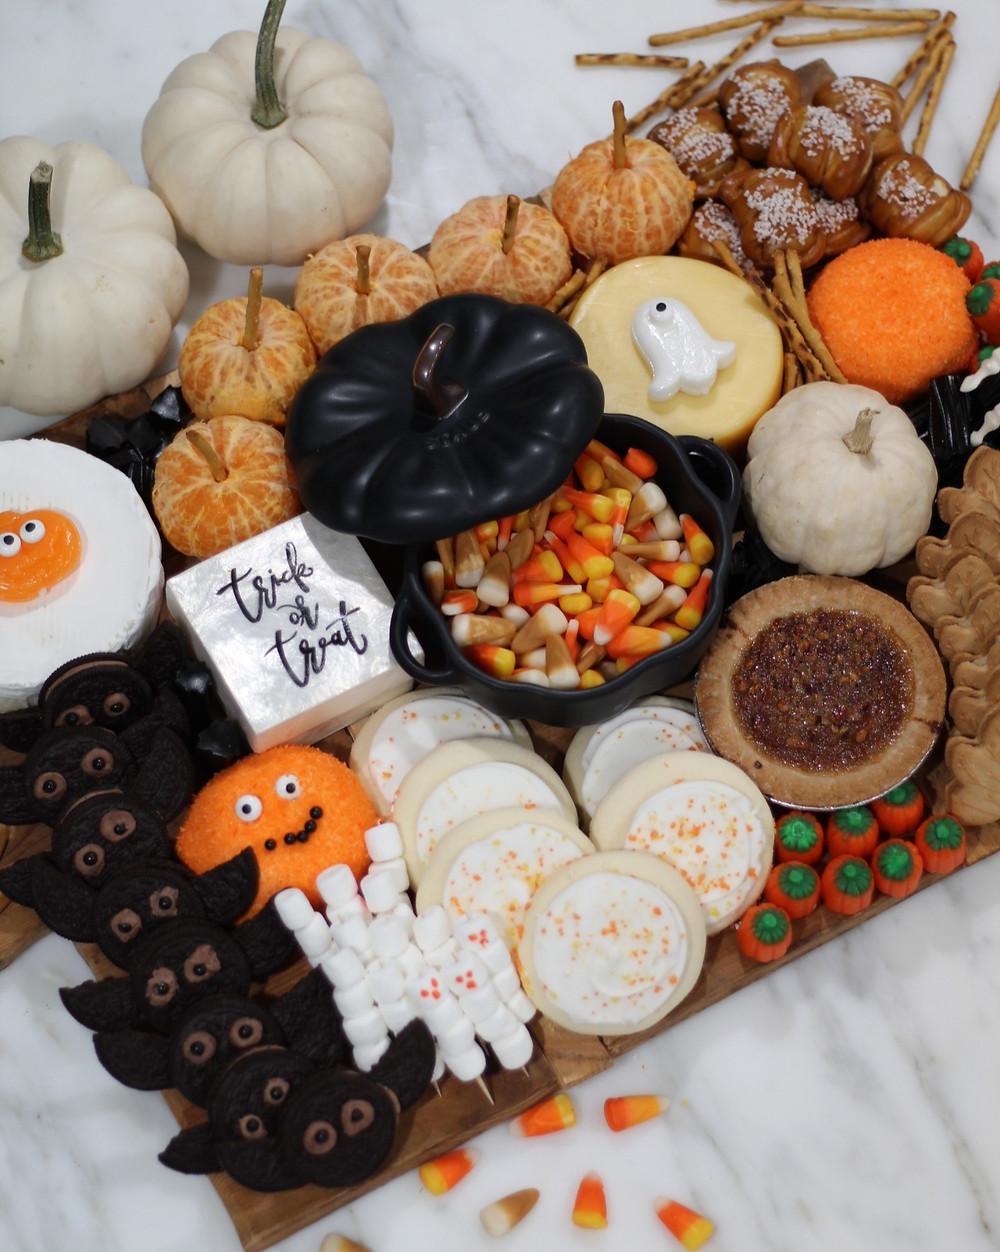 halloween charcuterie board, charcuterie board, halloween fun, snacks, food board